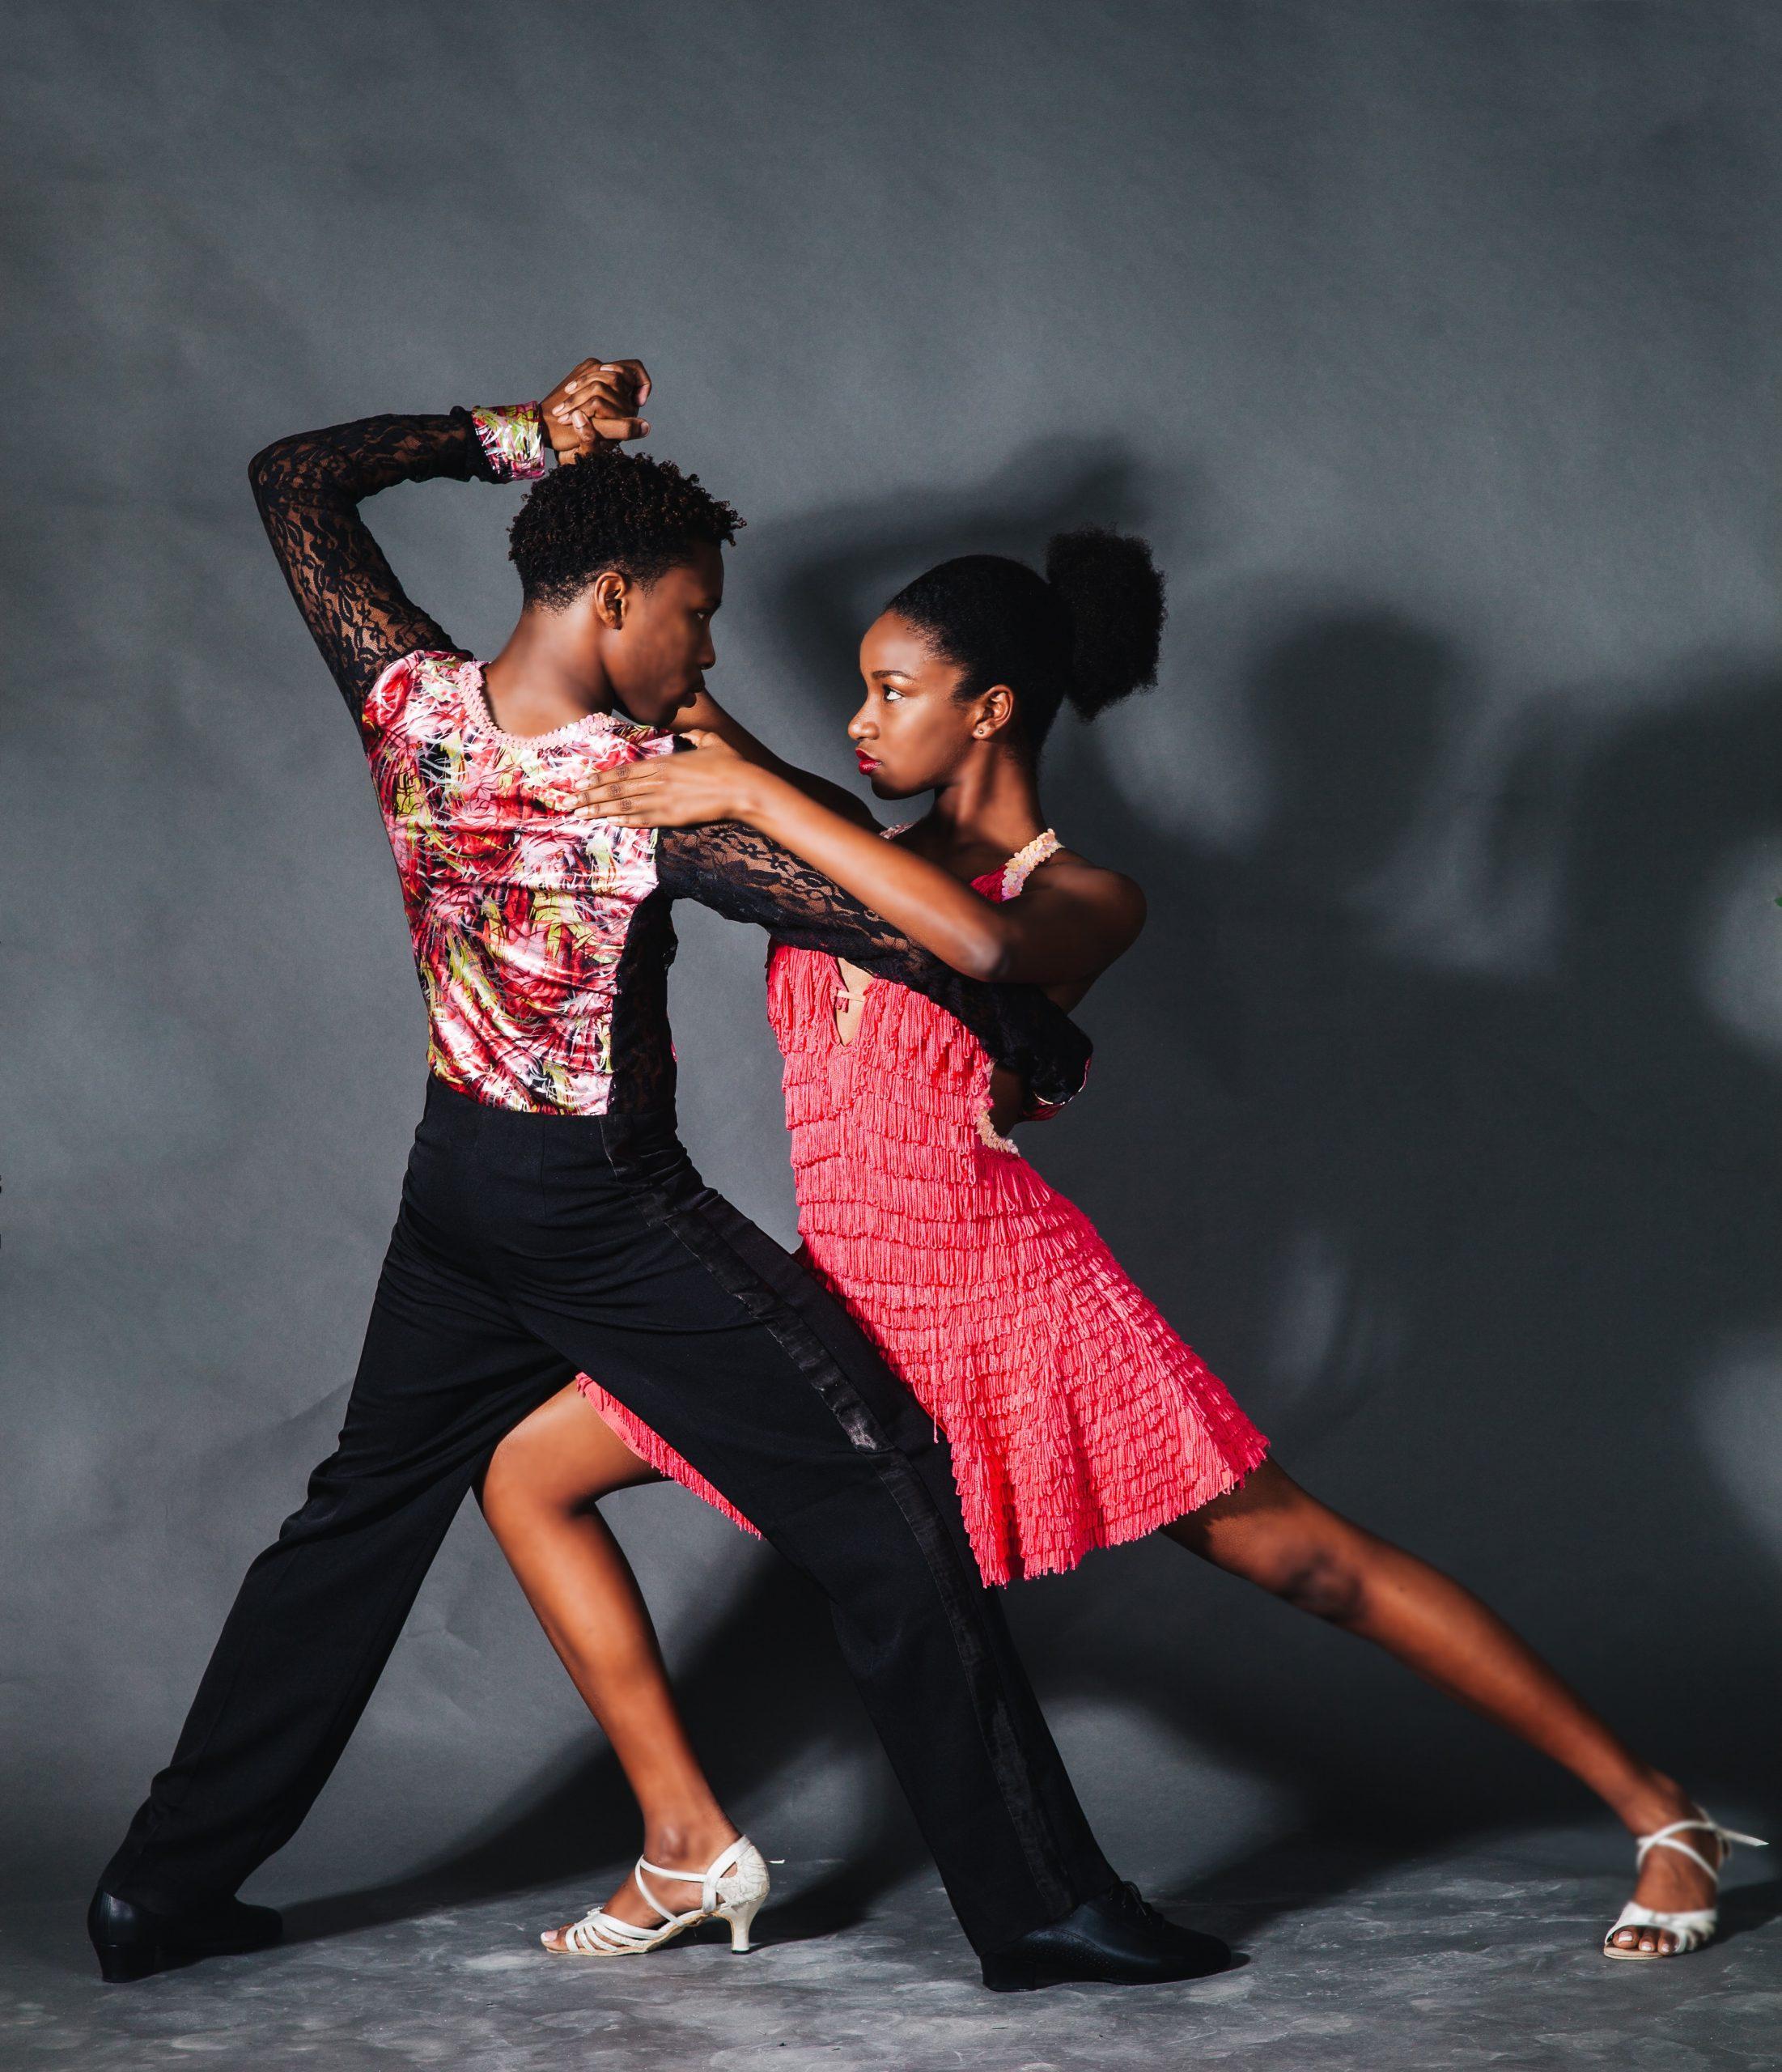 A couple dancing tango